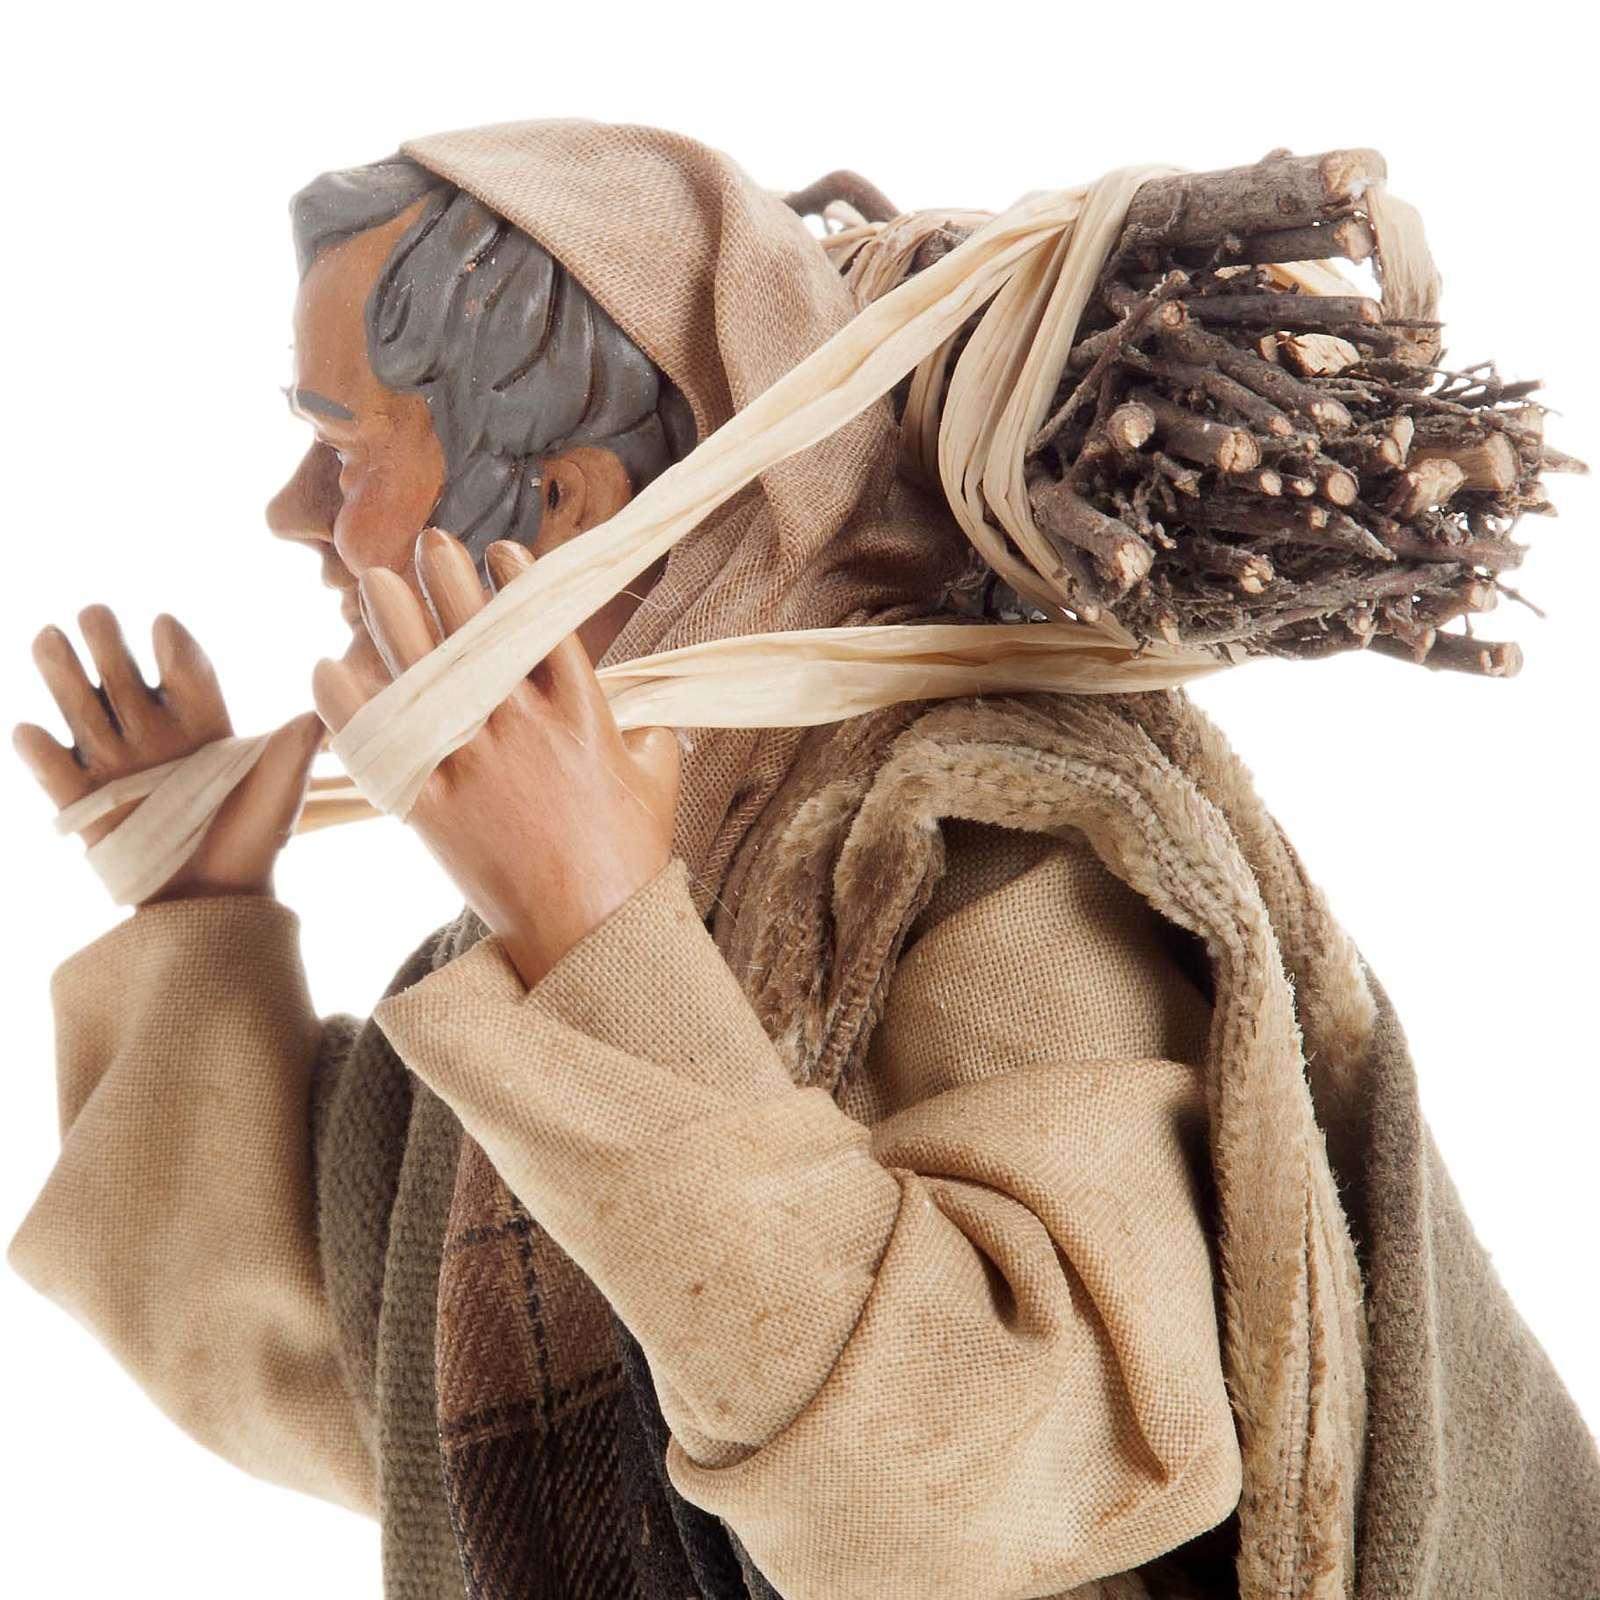 Neapolitan nativity figurine, woodman 18cm 4